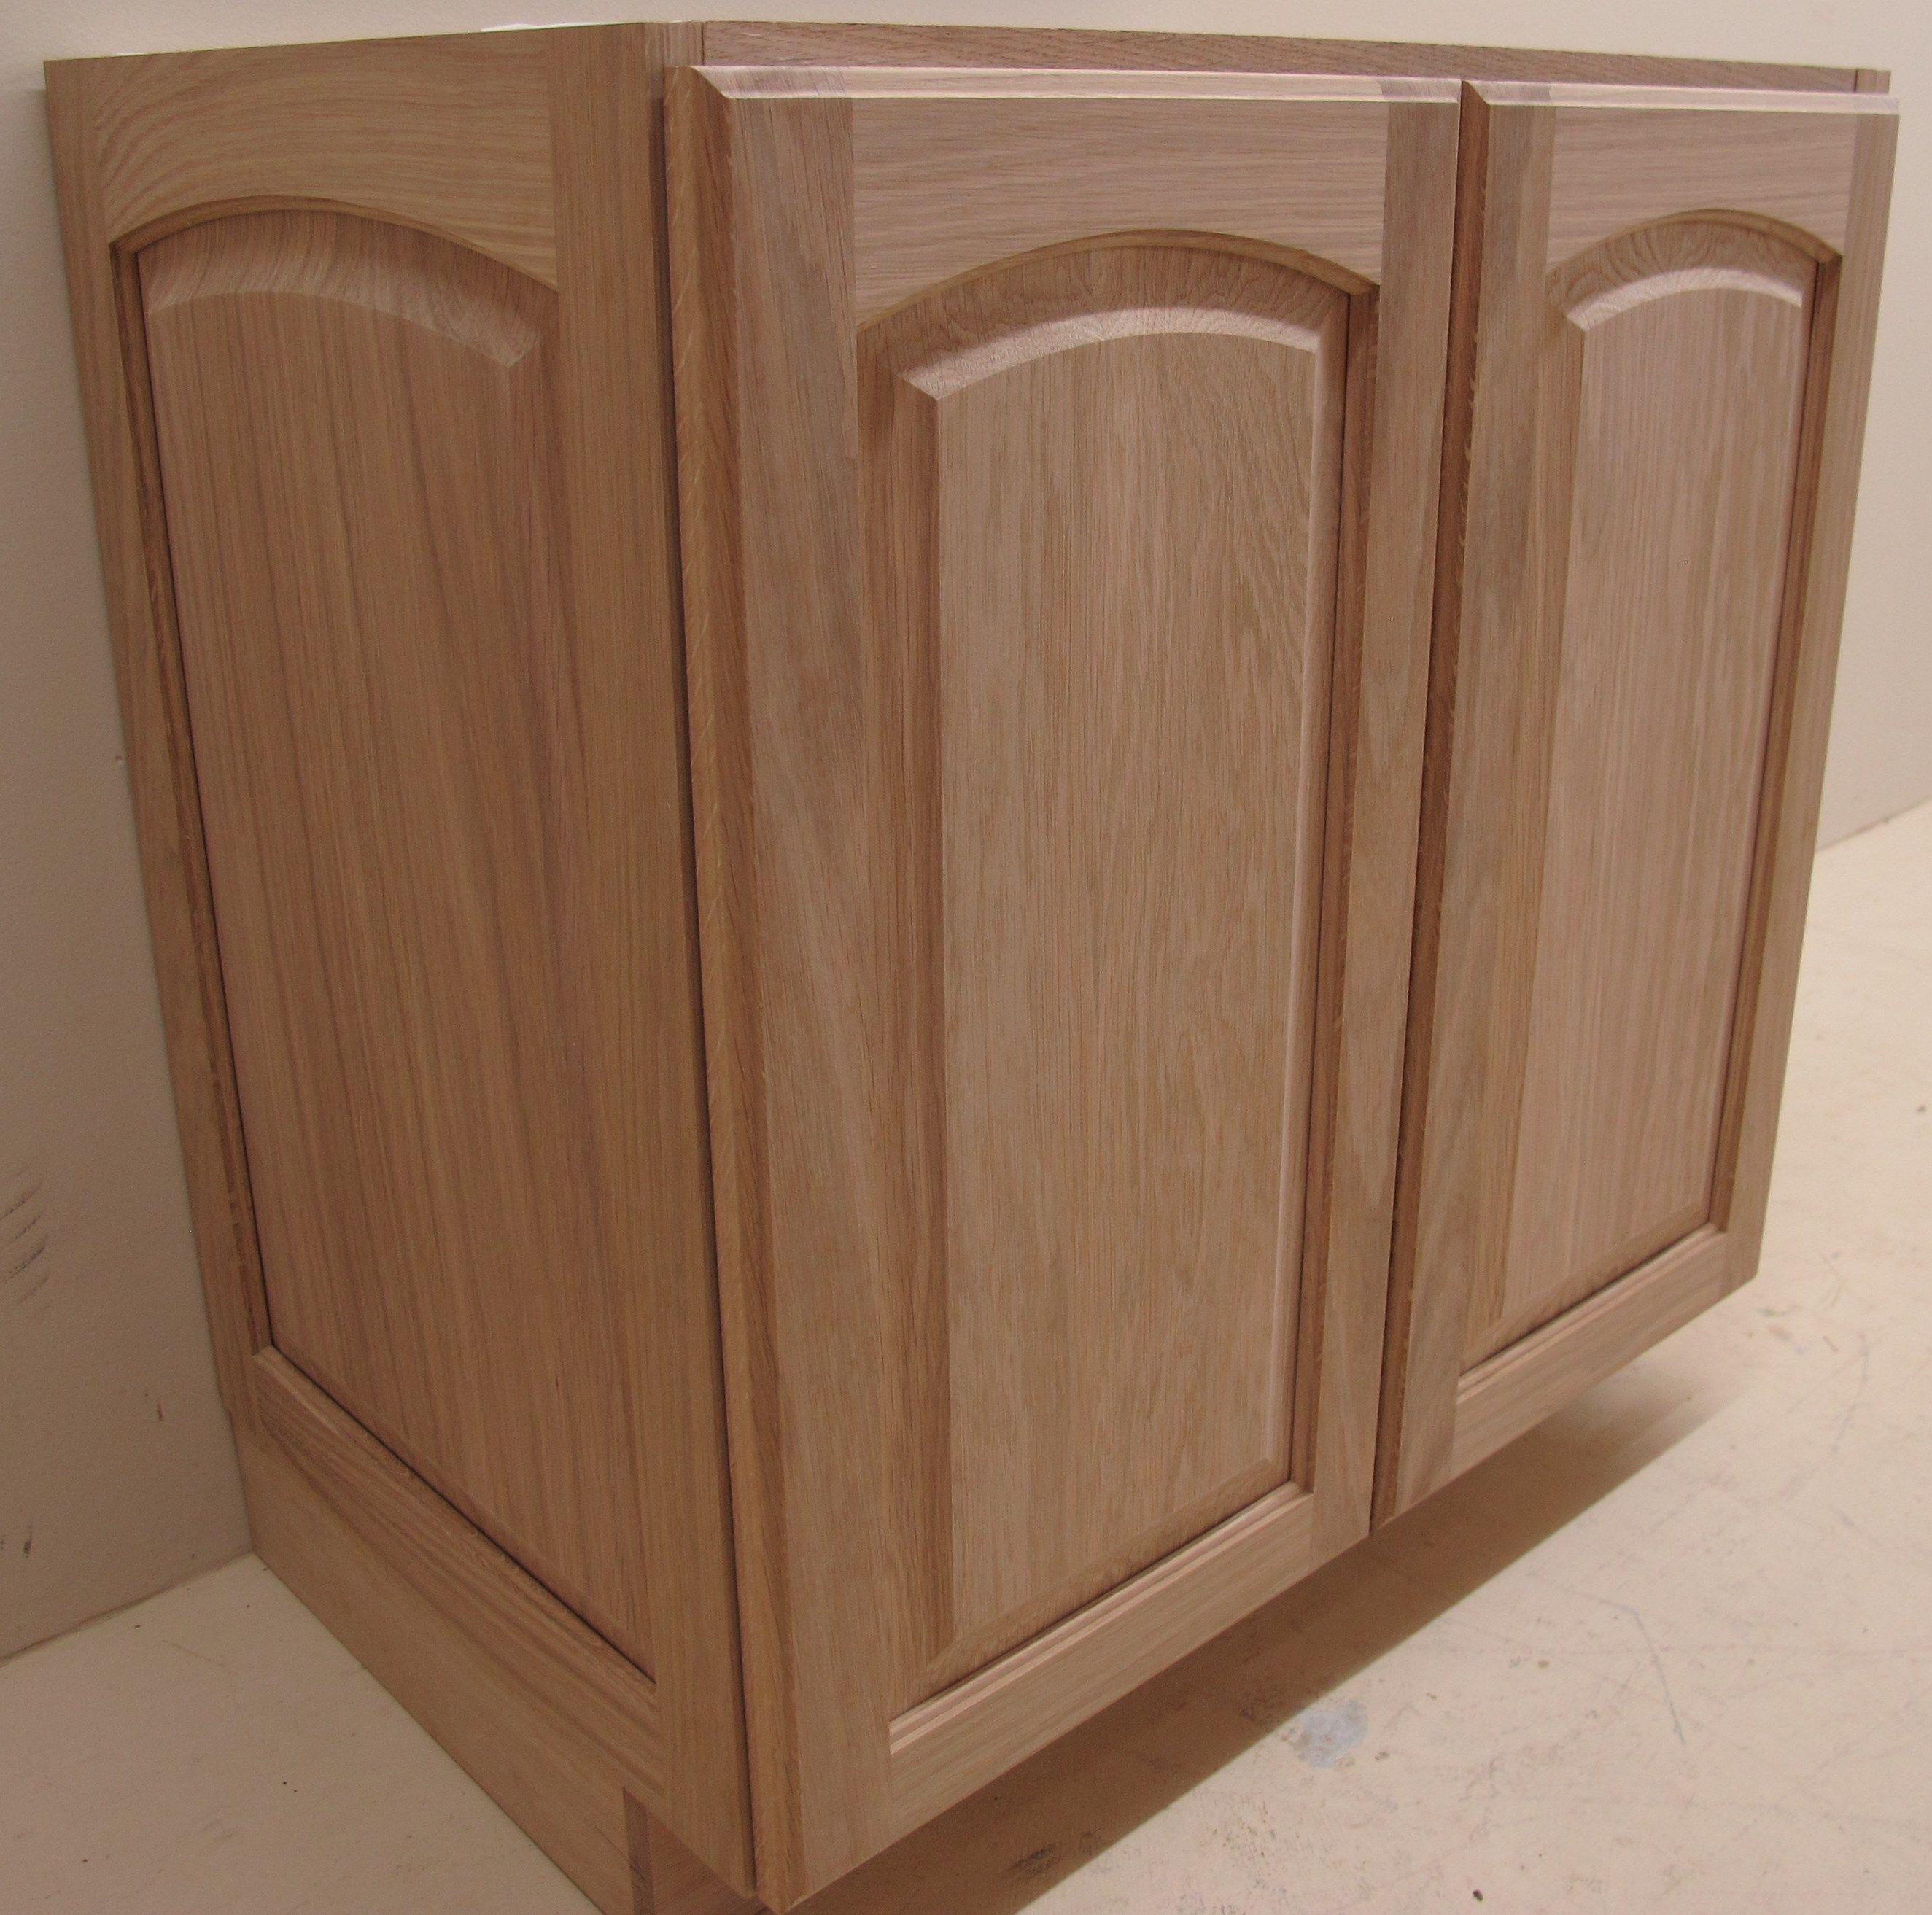 Natural Varnish Arched Raised Panel Vanity   Small vanity ...